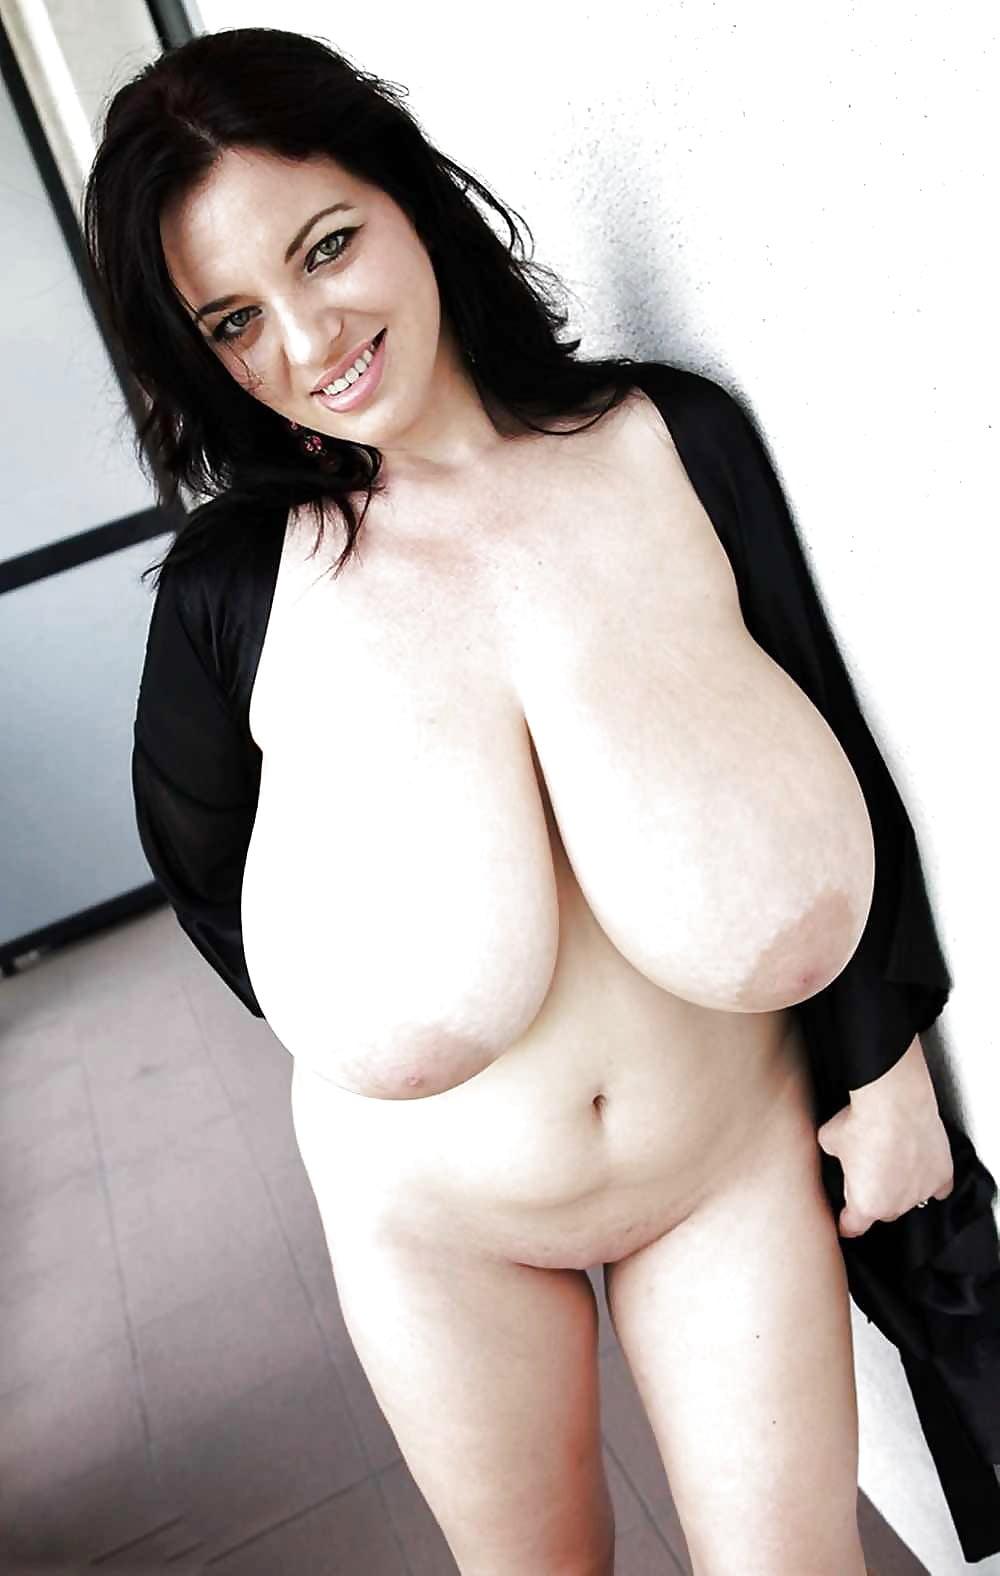 Big boobs cell nude — photo 5